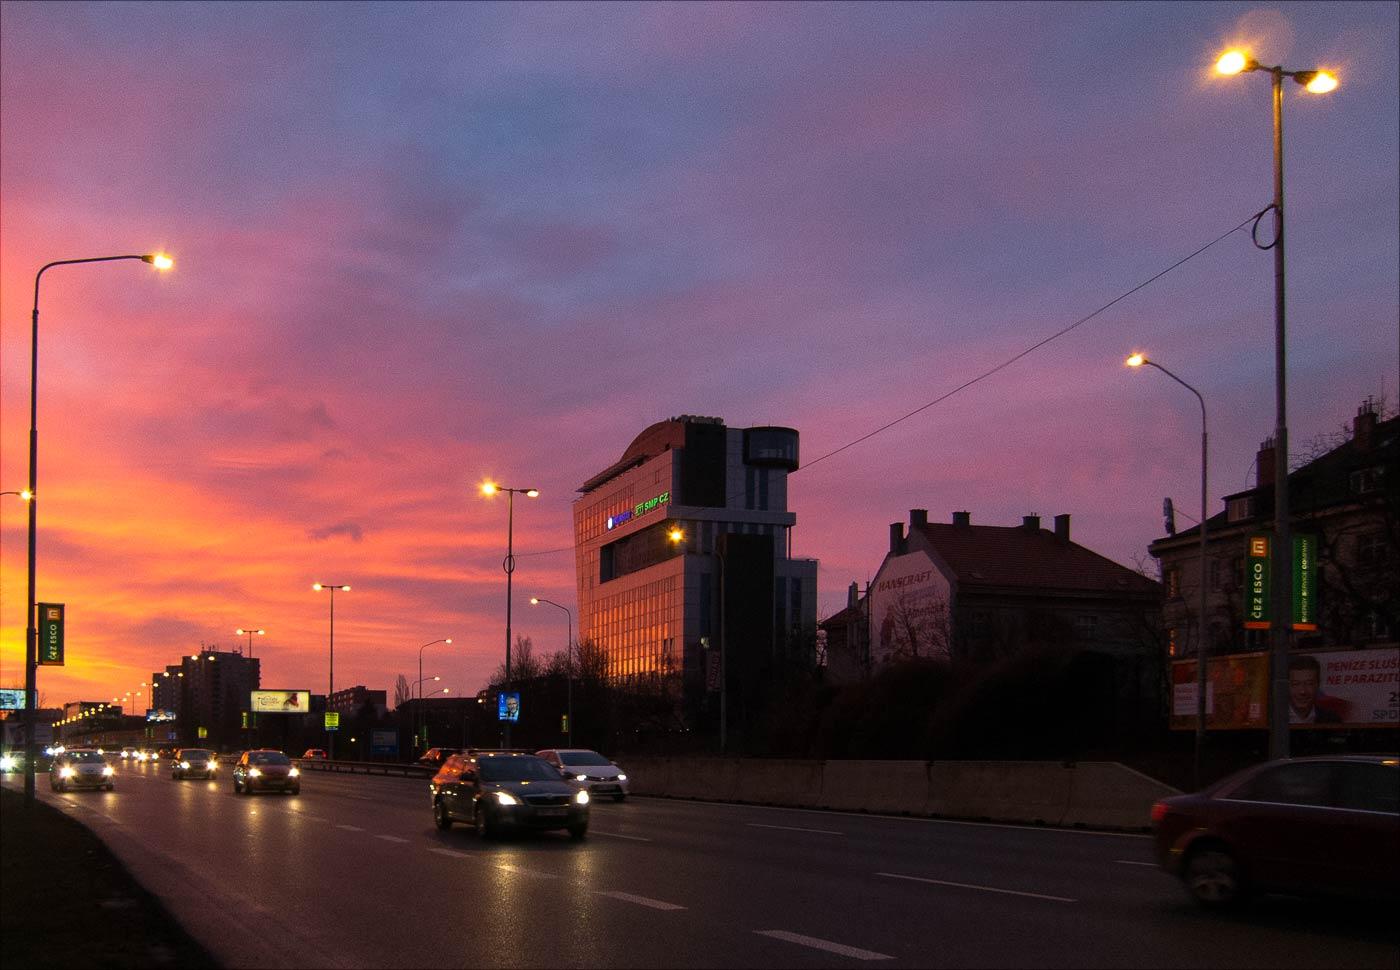 Утренняя прогулка перед работой, Прага, район Панкрац